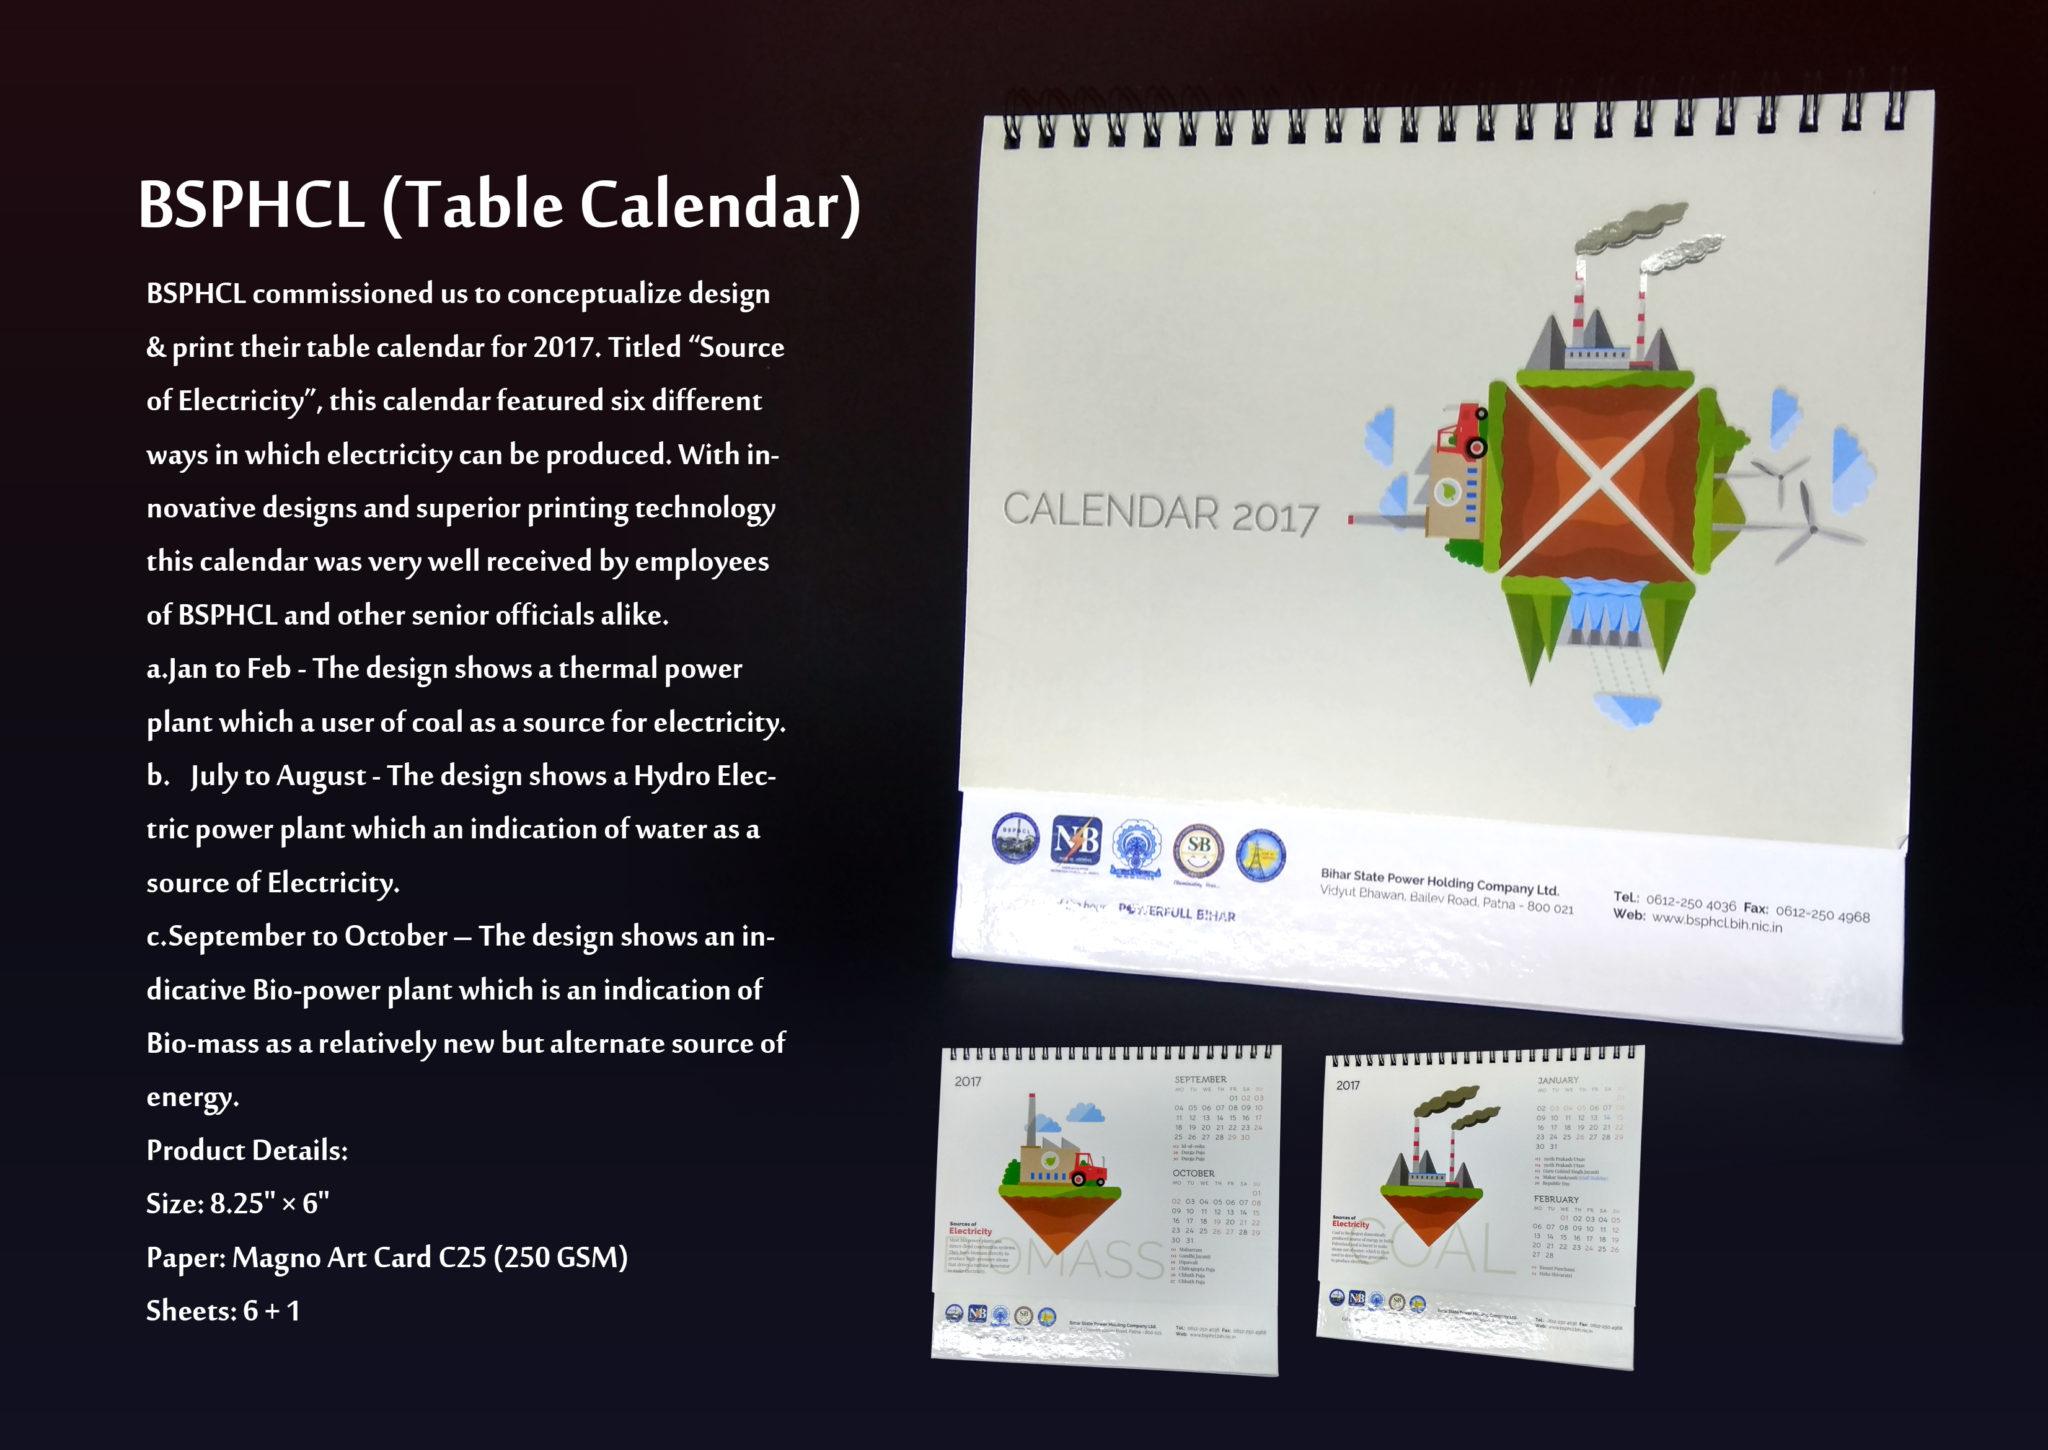 Calendar  Koseli Arts & Crafts pertaining to Bihar Calendar 2017